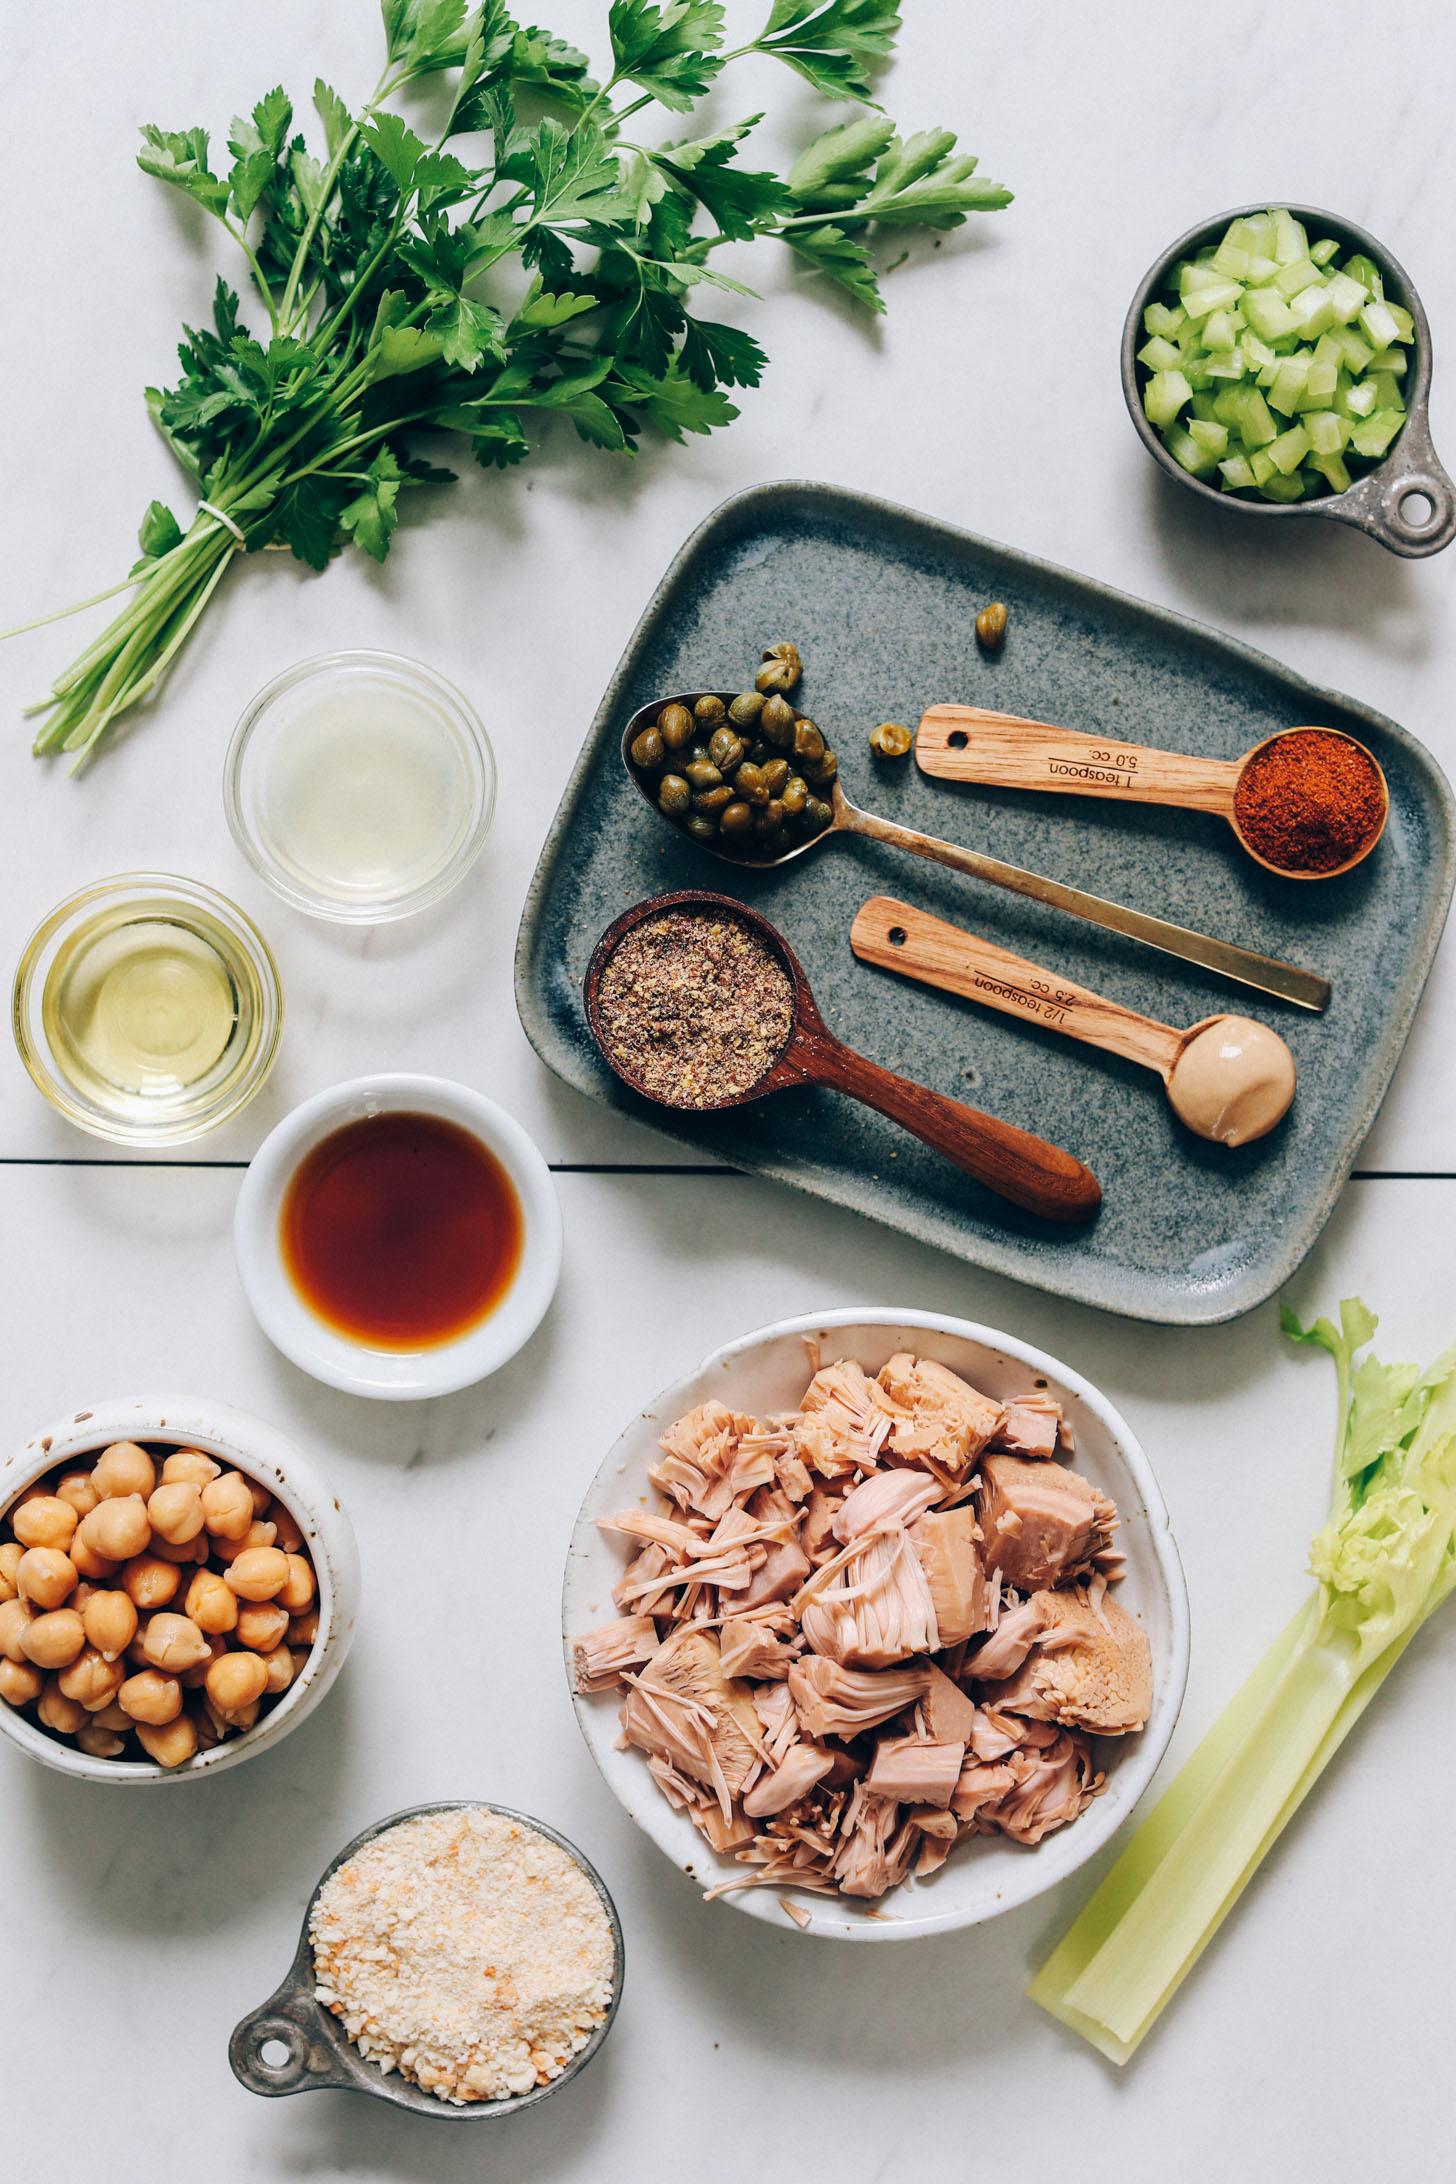 Parsley, celery, Old Bay seasoning, capers, mustard, flaxseed meal, avocado oil, worcestershire, chickpeas, breadcrumbs, jackfruit, and celery